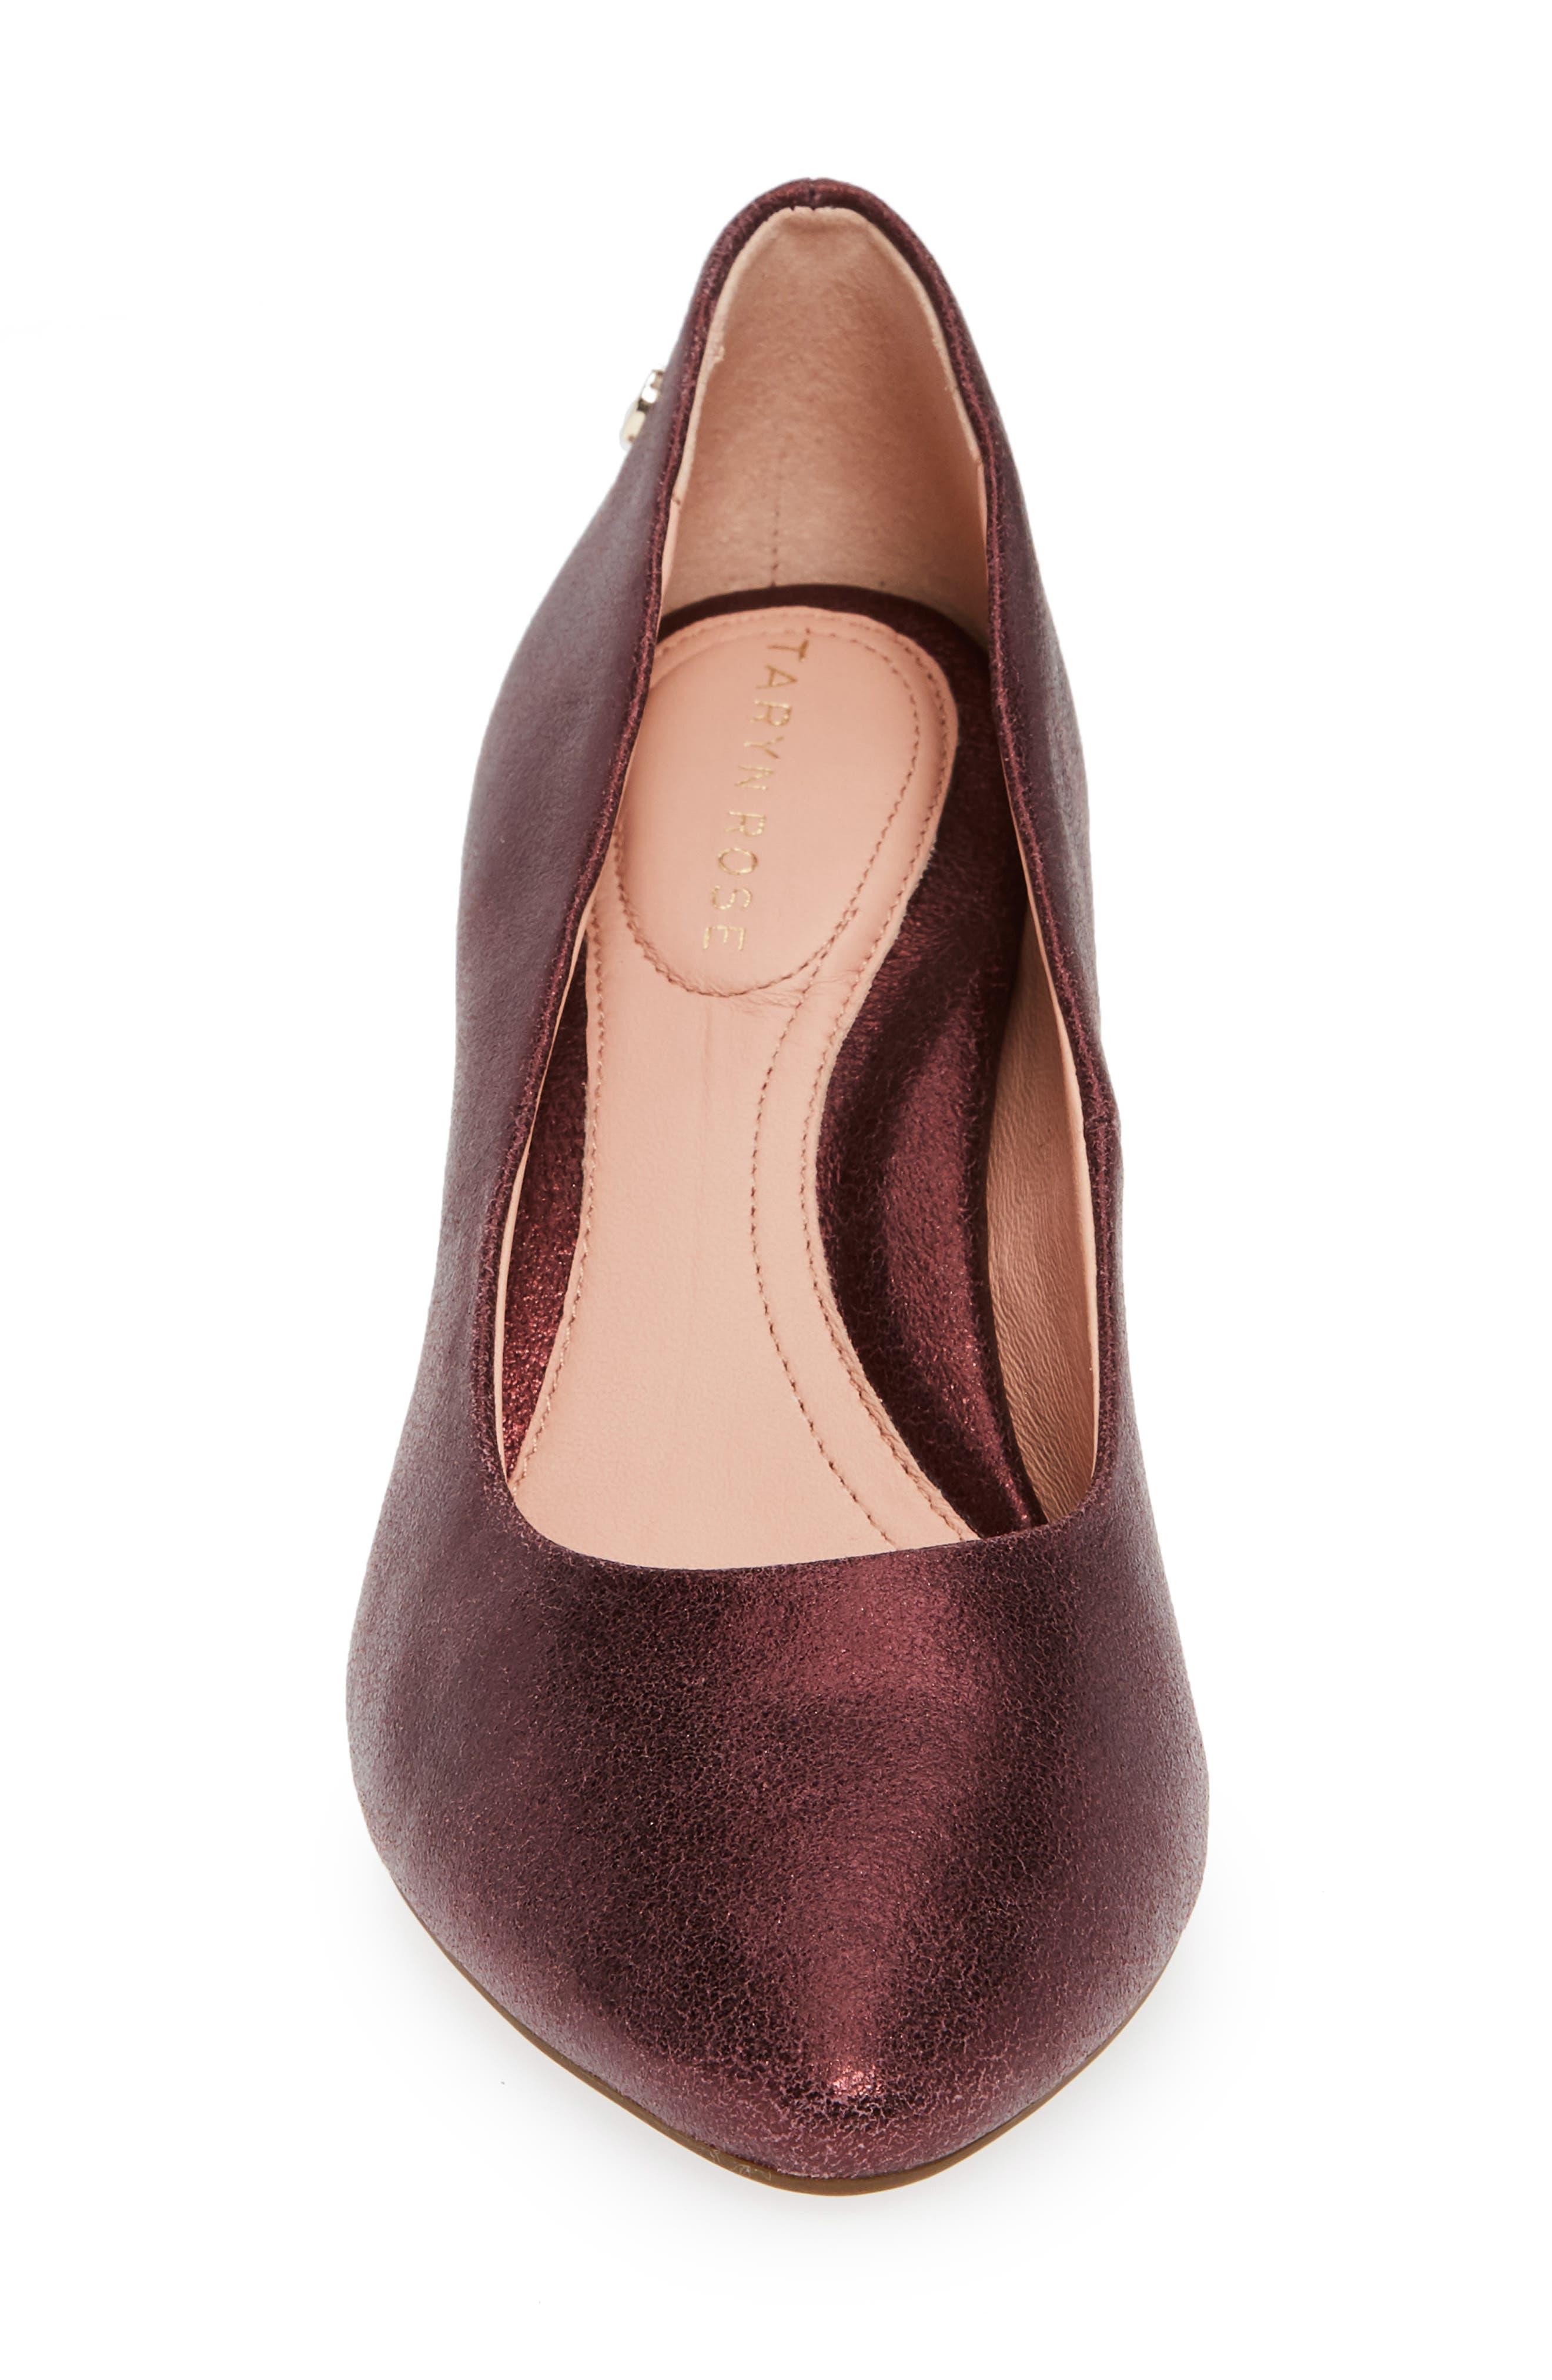 Tamara Pump,                             Alternate thumbnail 6, color,                             Fig Leather